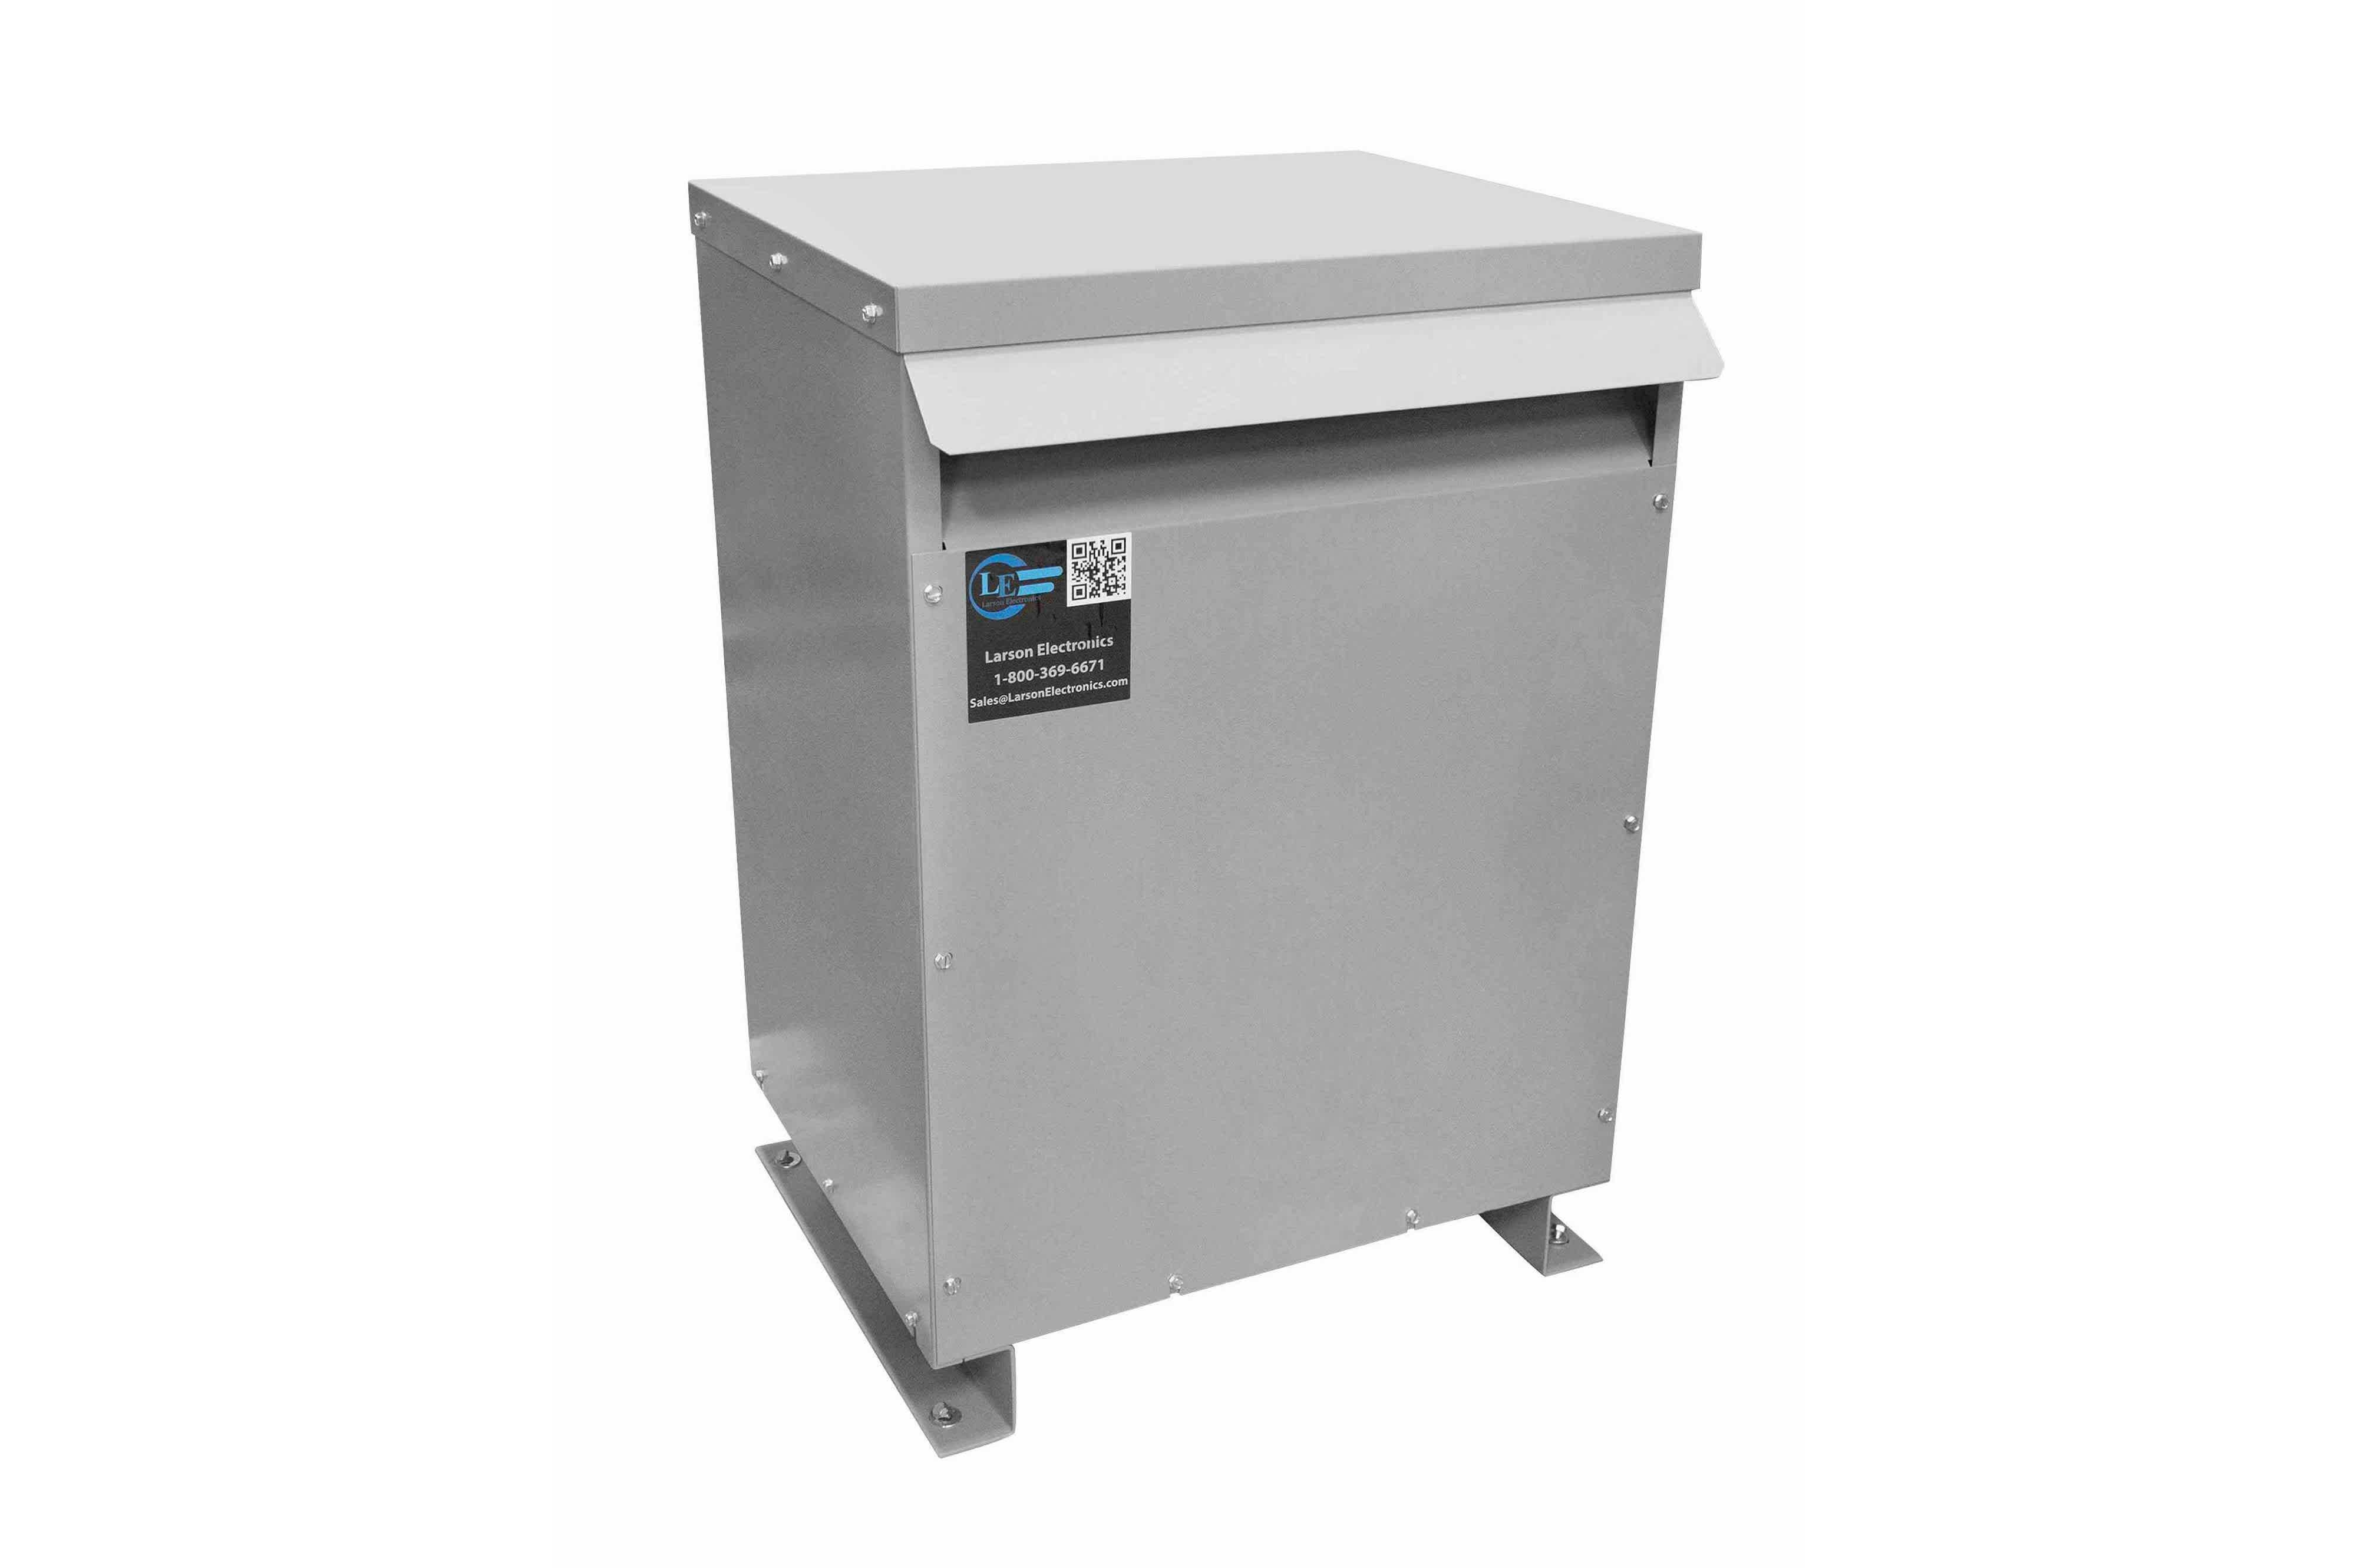 225 kVA 3PH Isolation Transformer, 220V Wye Primary, 480V Delta Secondary, N3R, Ventilated, 60 Hz